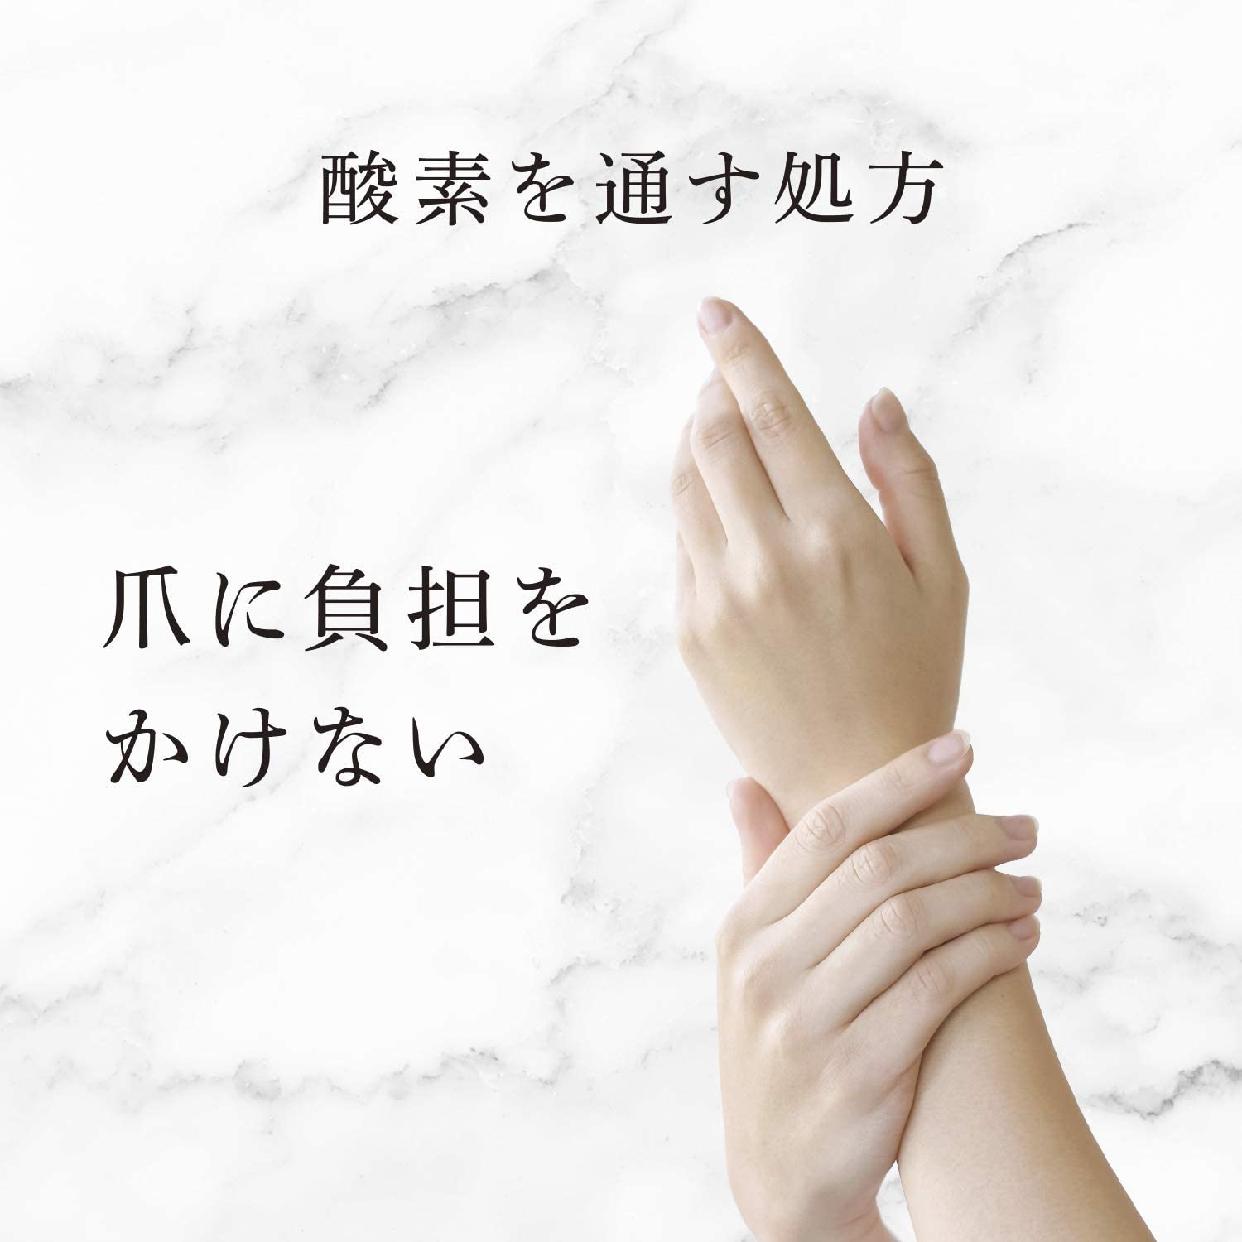 JUMII TOKYO(ジュミートウキョウ) 60セカンズ ベースコートの商品画像5